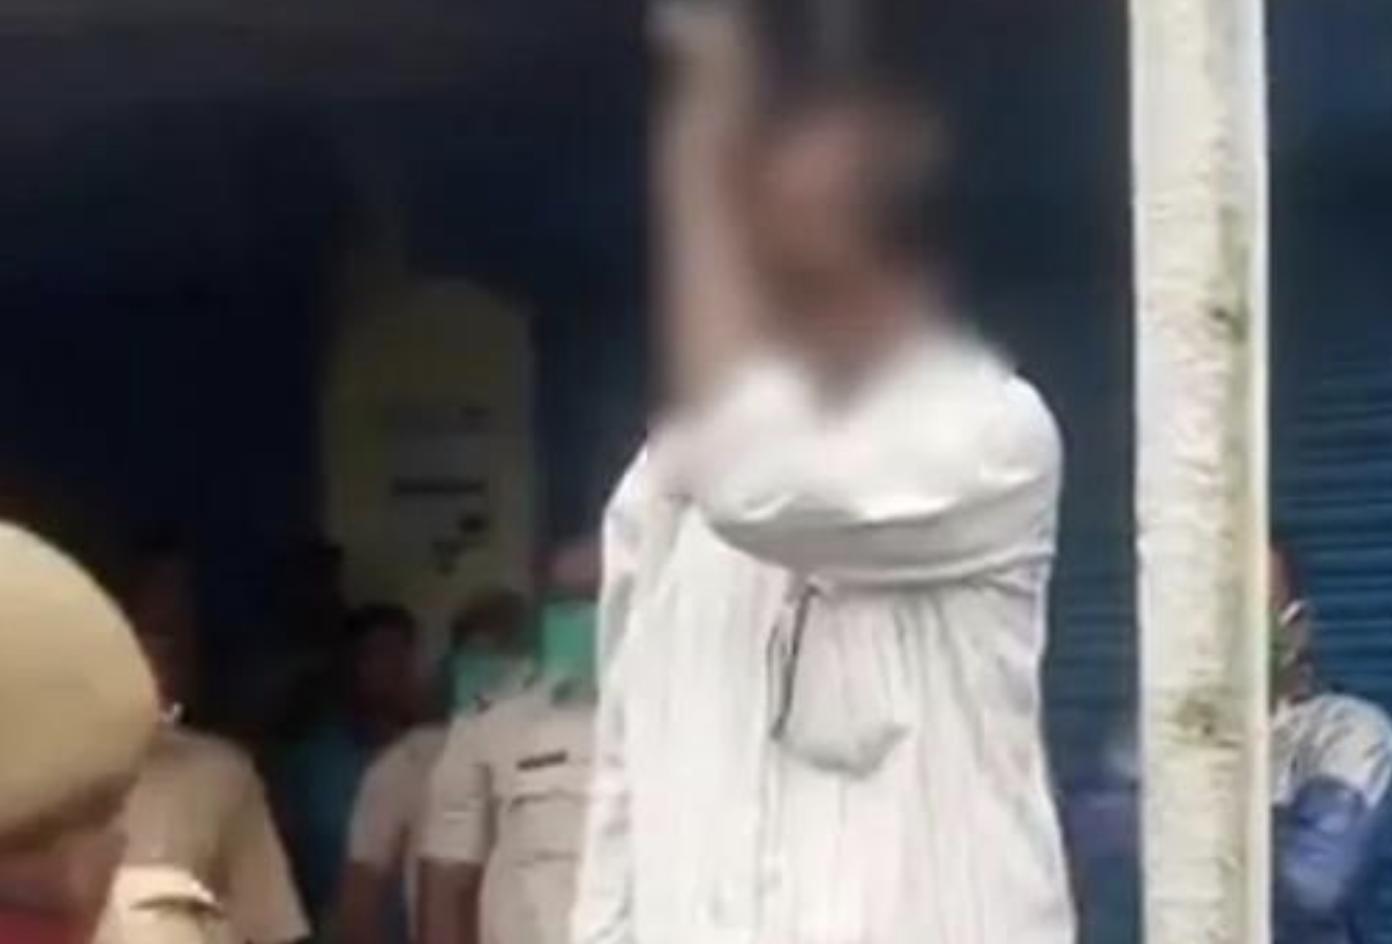 allbetgaming:印度爆陌头抗议:攻击公交车放话围堵该邦所有警局 第3张